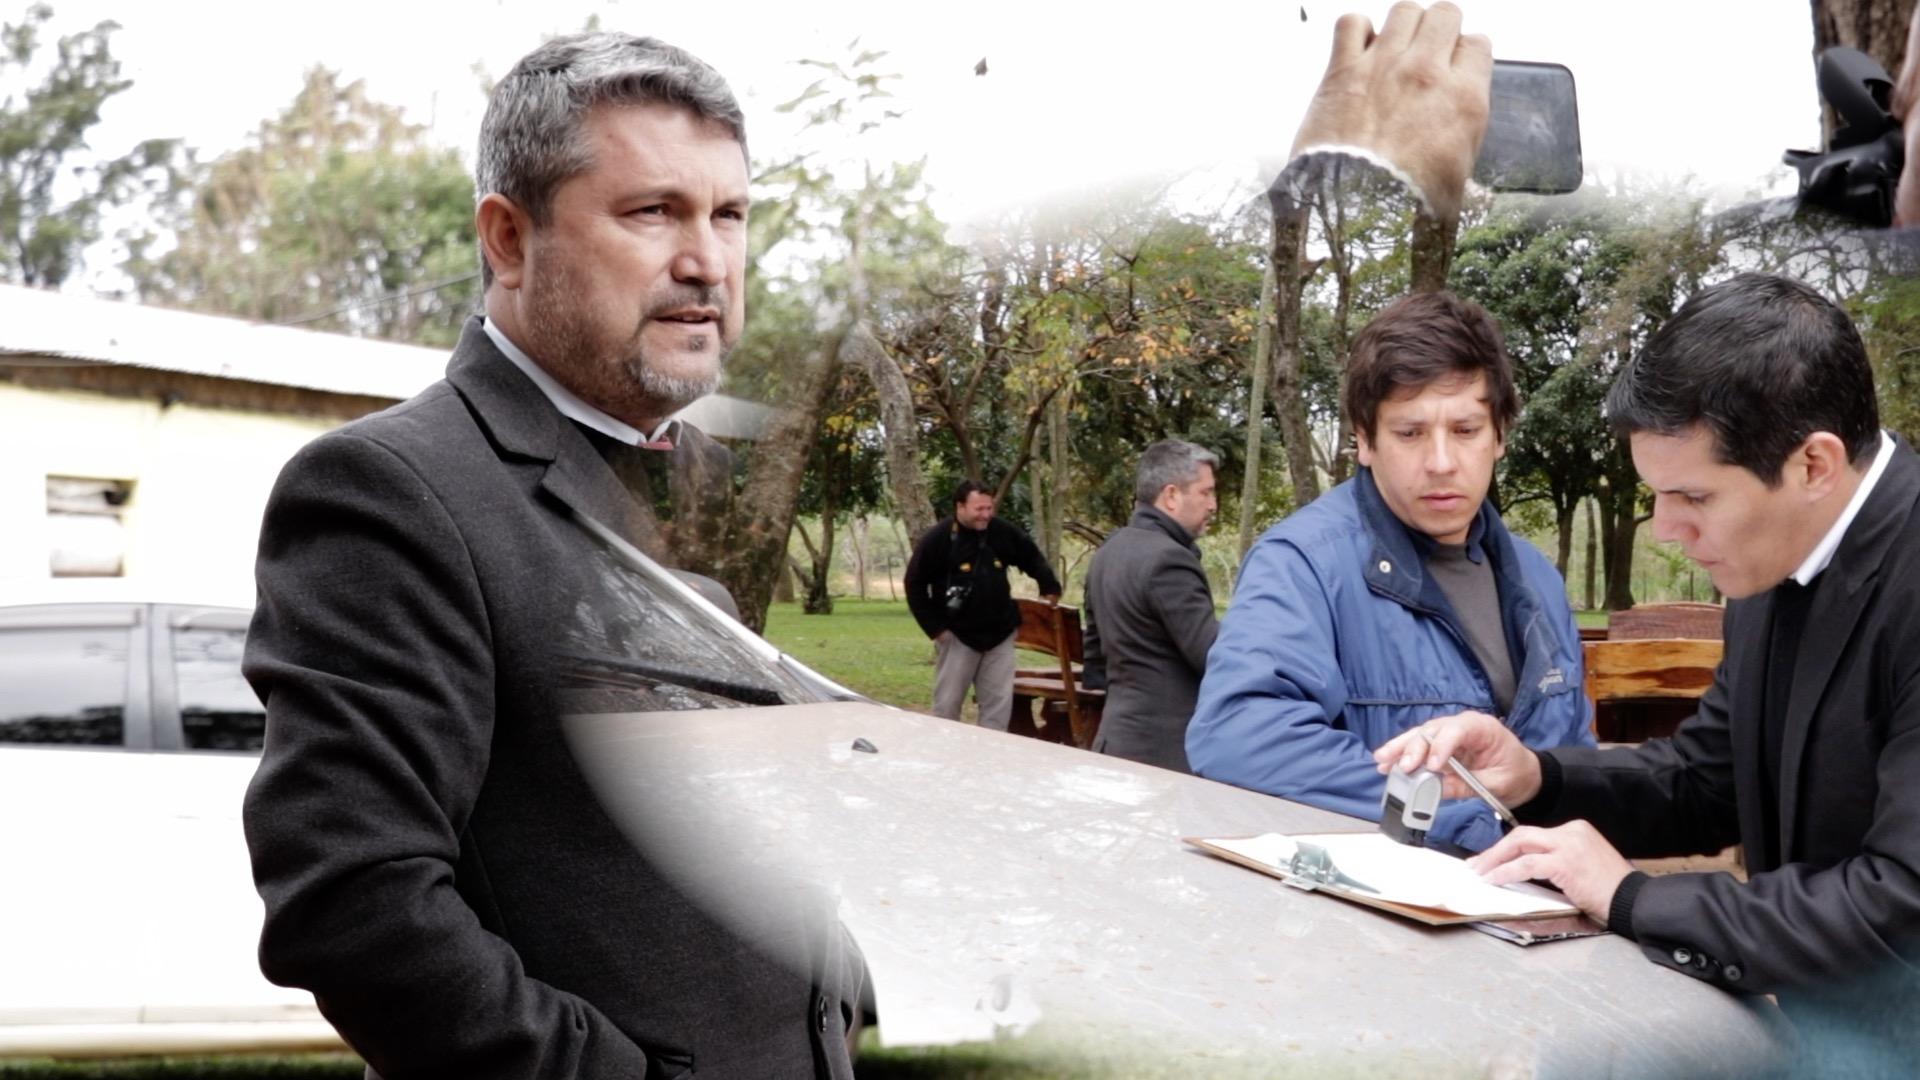 Staatsanwalt und RA Dr. Ariel Sanabria unterfertigt Protokoll